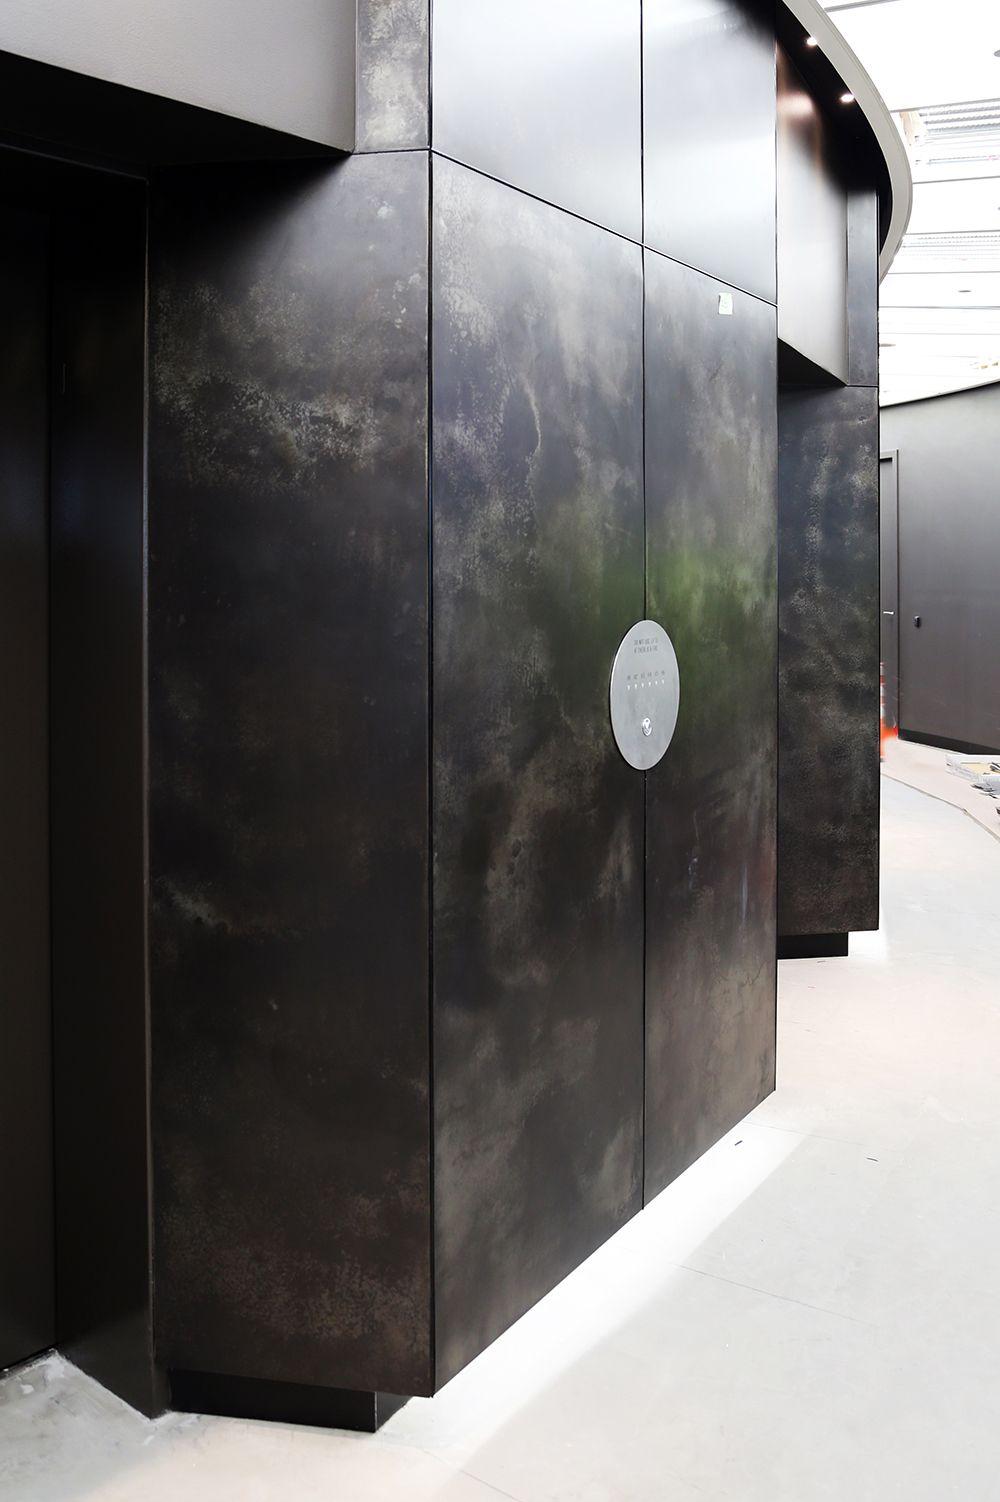 Feature Walls Axolotl Sheet Metal Wall Metal Wall Panel Feature Wall